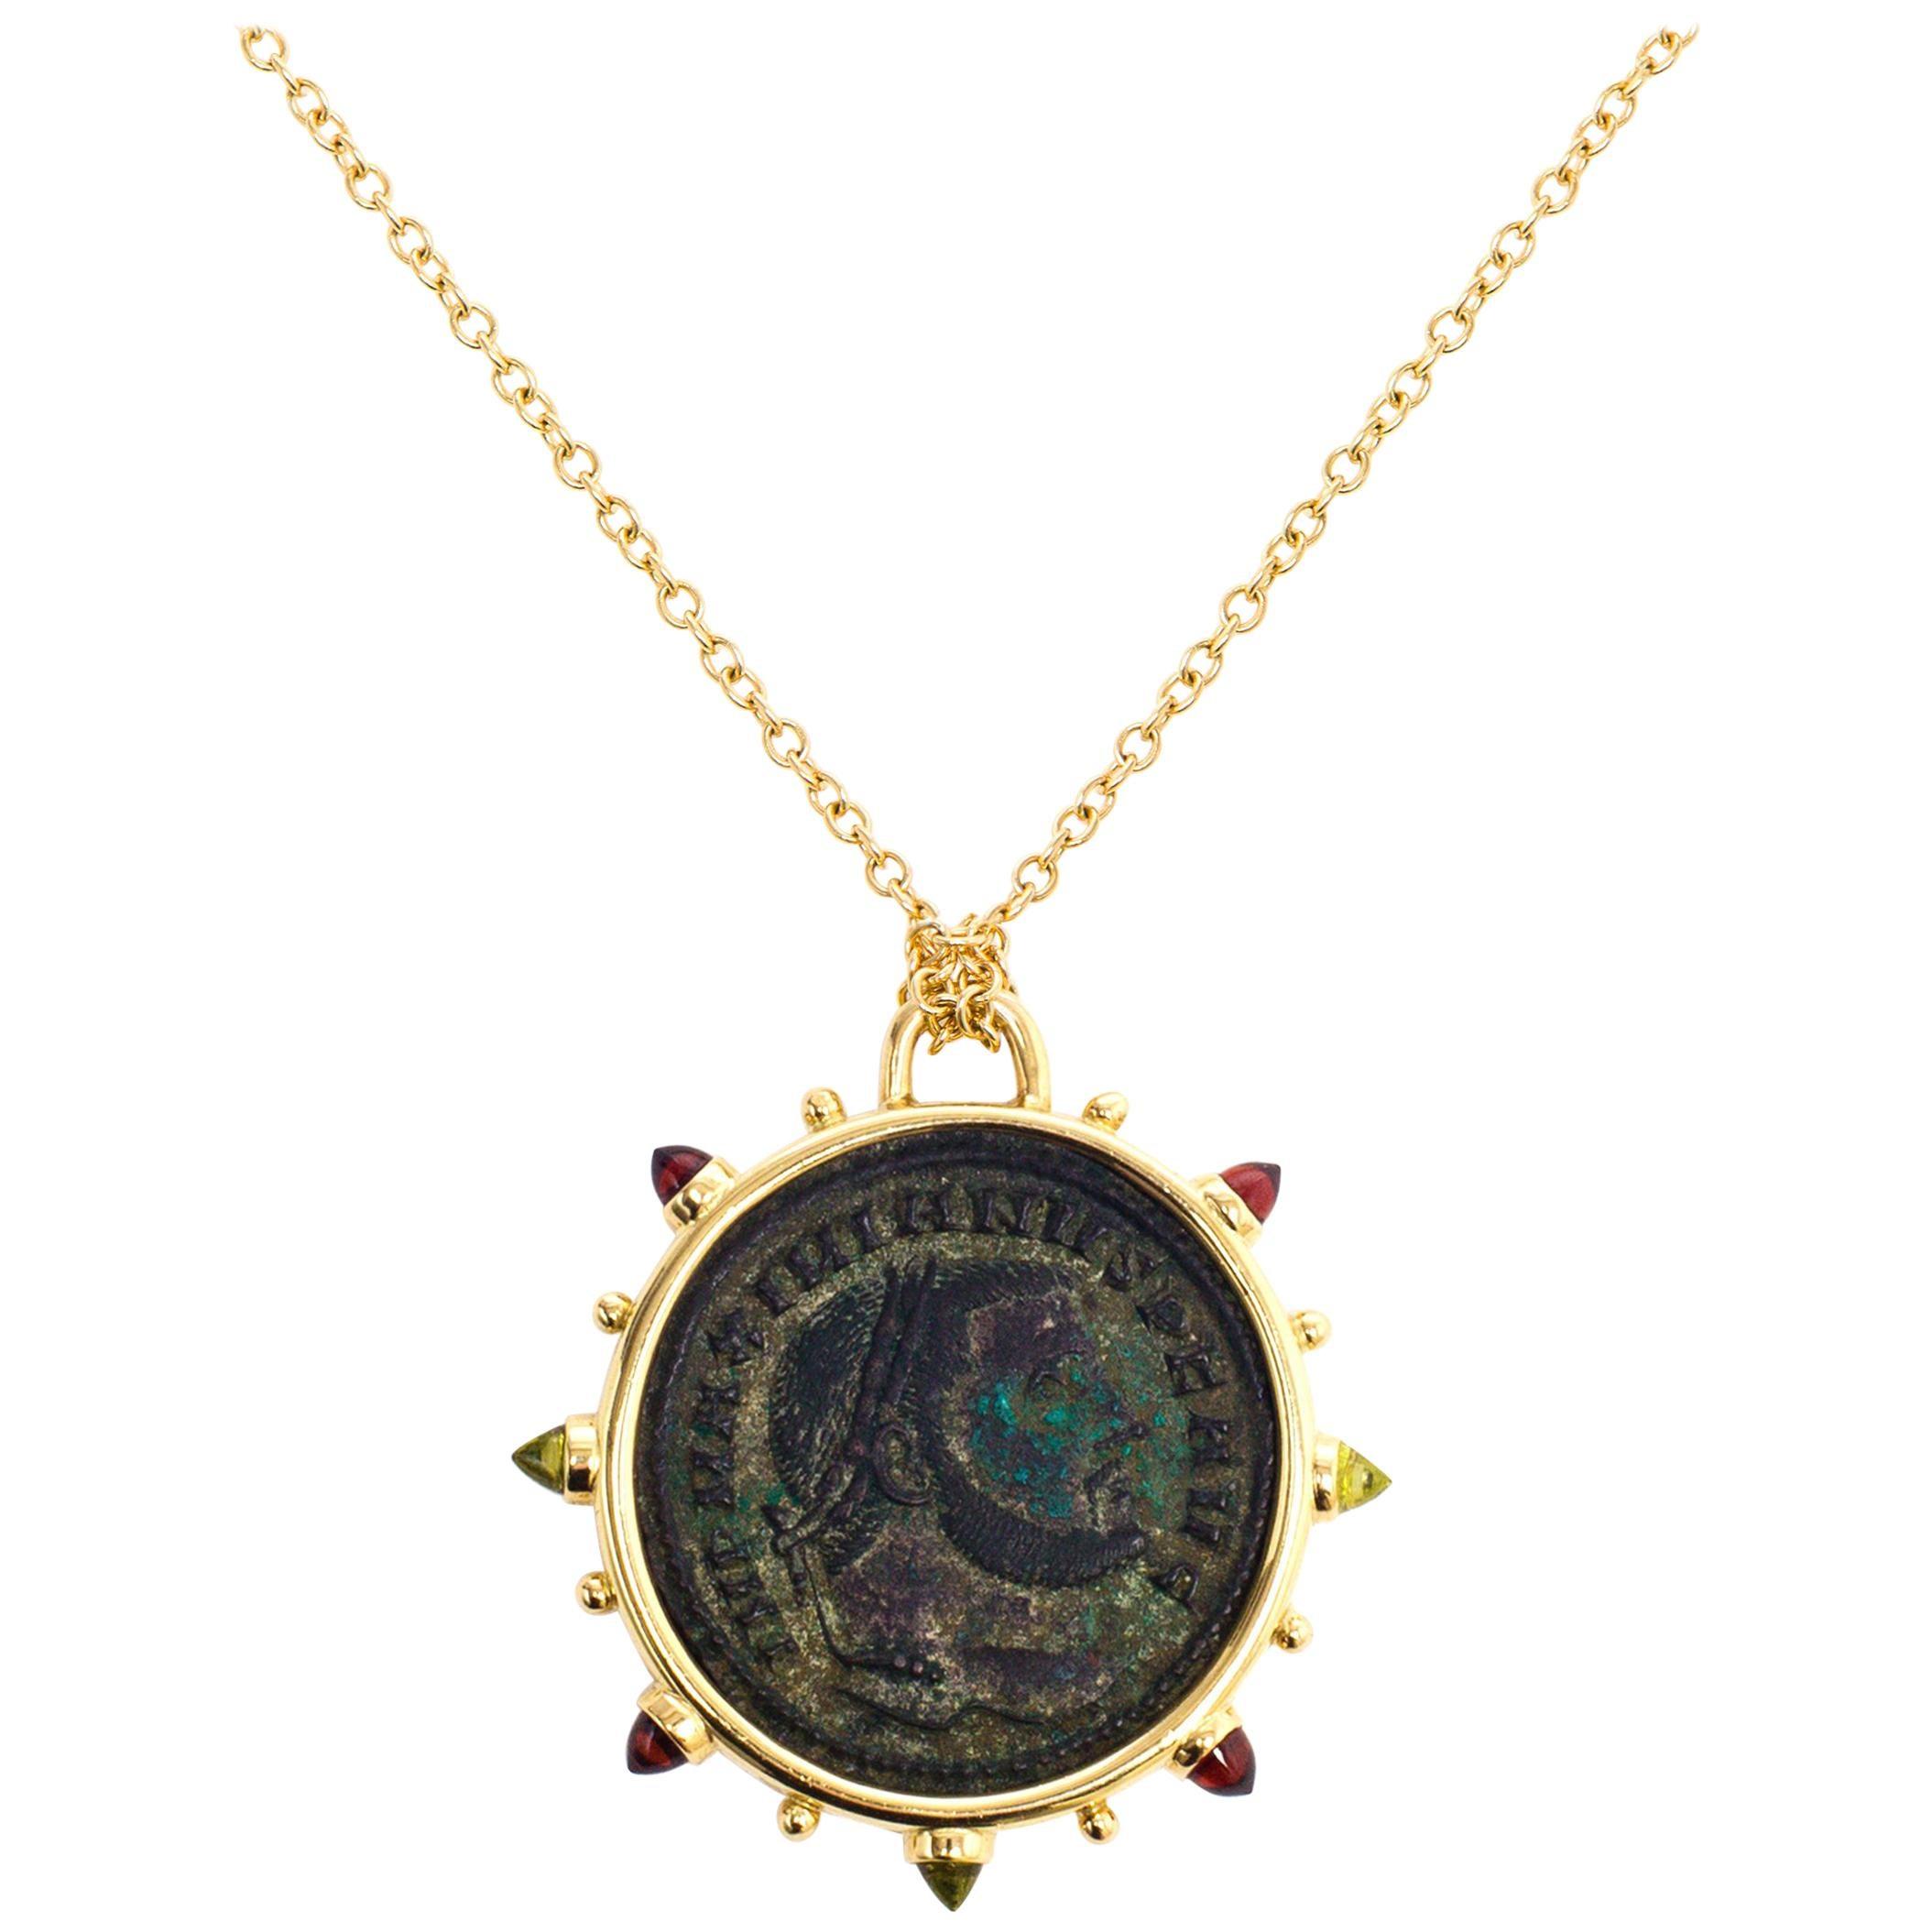 Dubini Empires Ancient Bronze Coin Medallion 18 Karat Yellow Gold Necklace